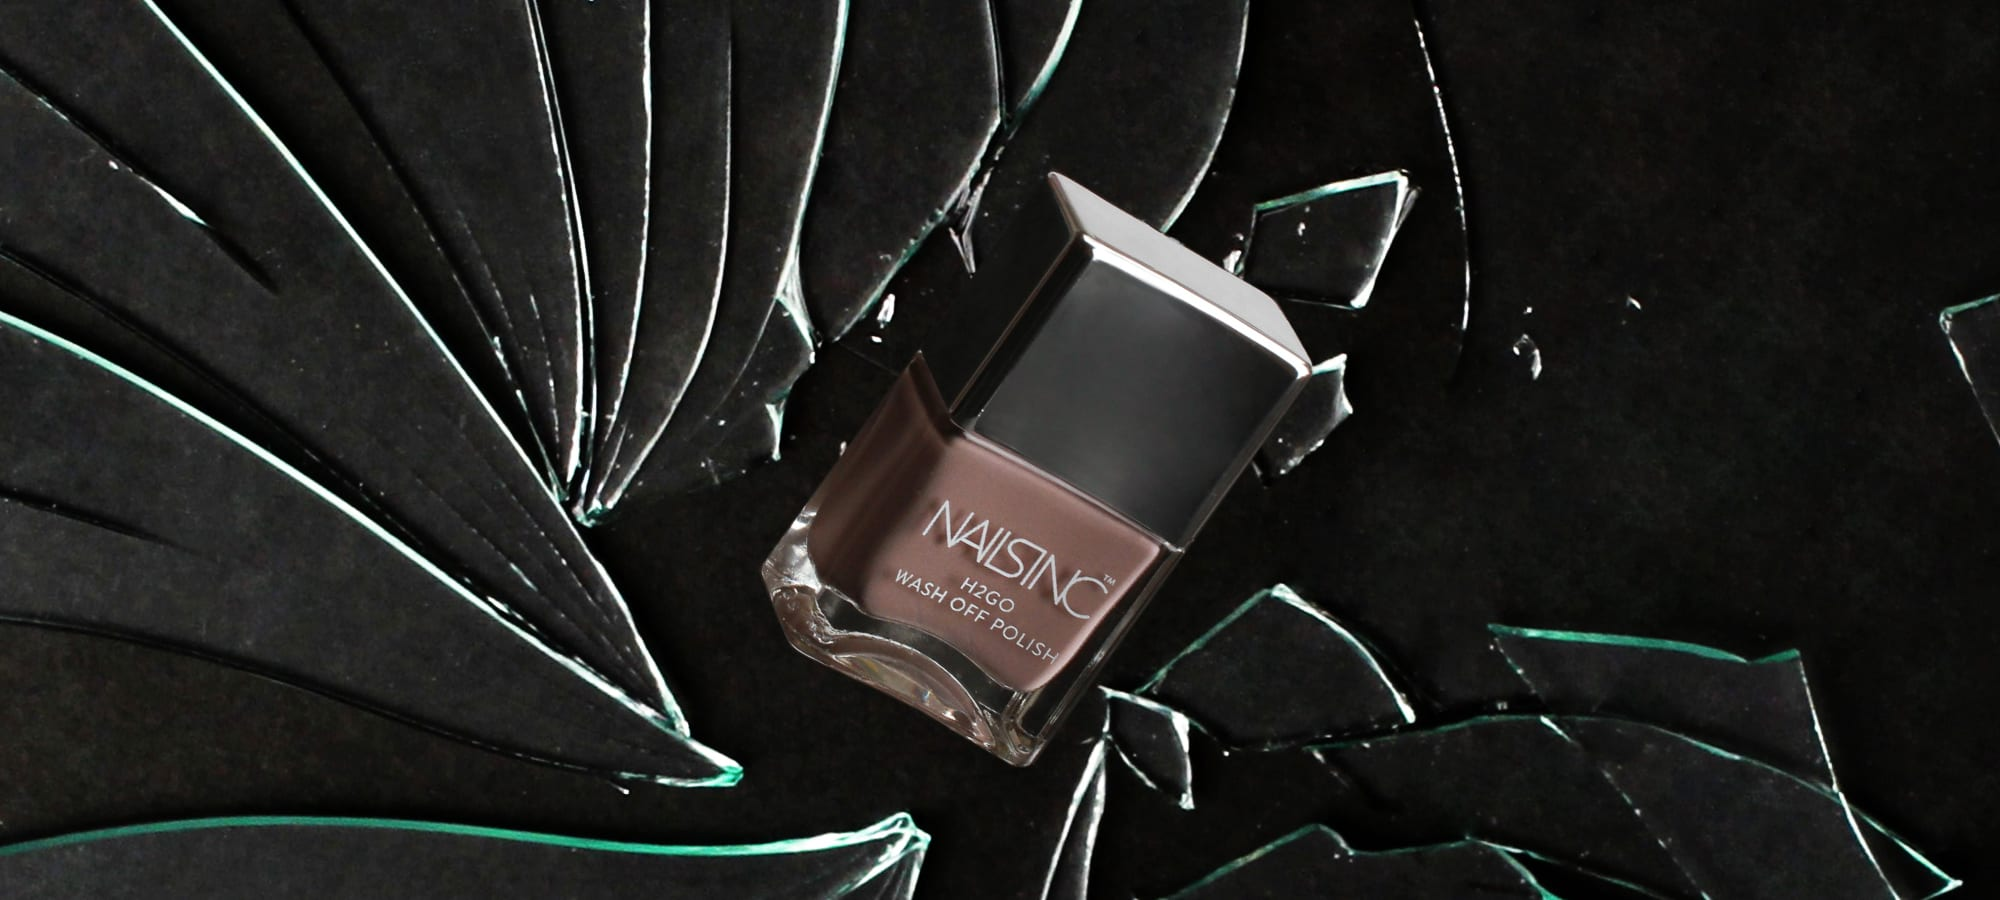 nails_inc_beauty_breakthrough